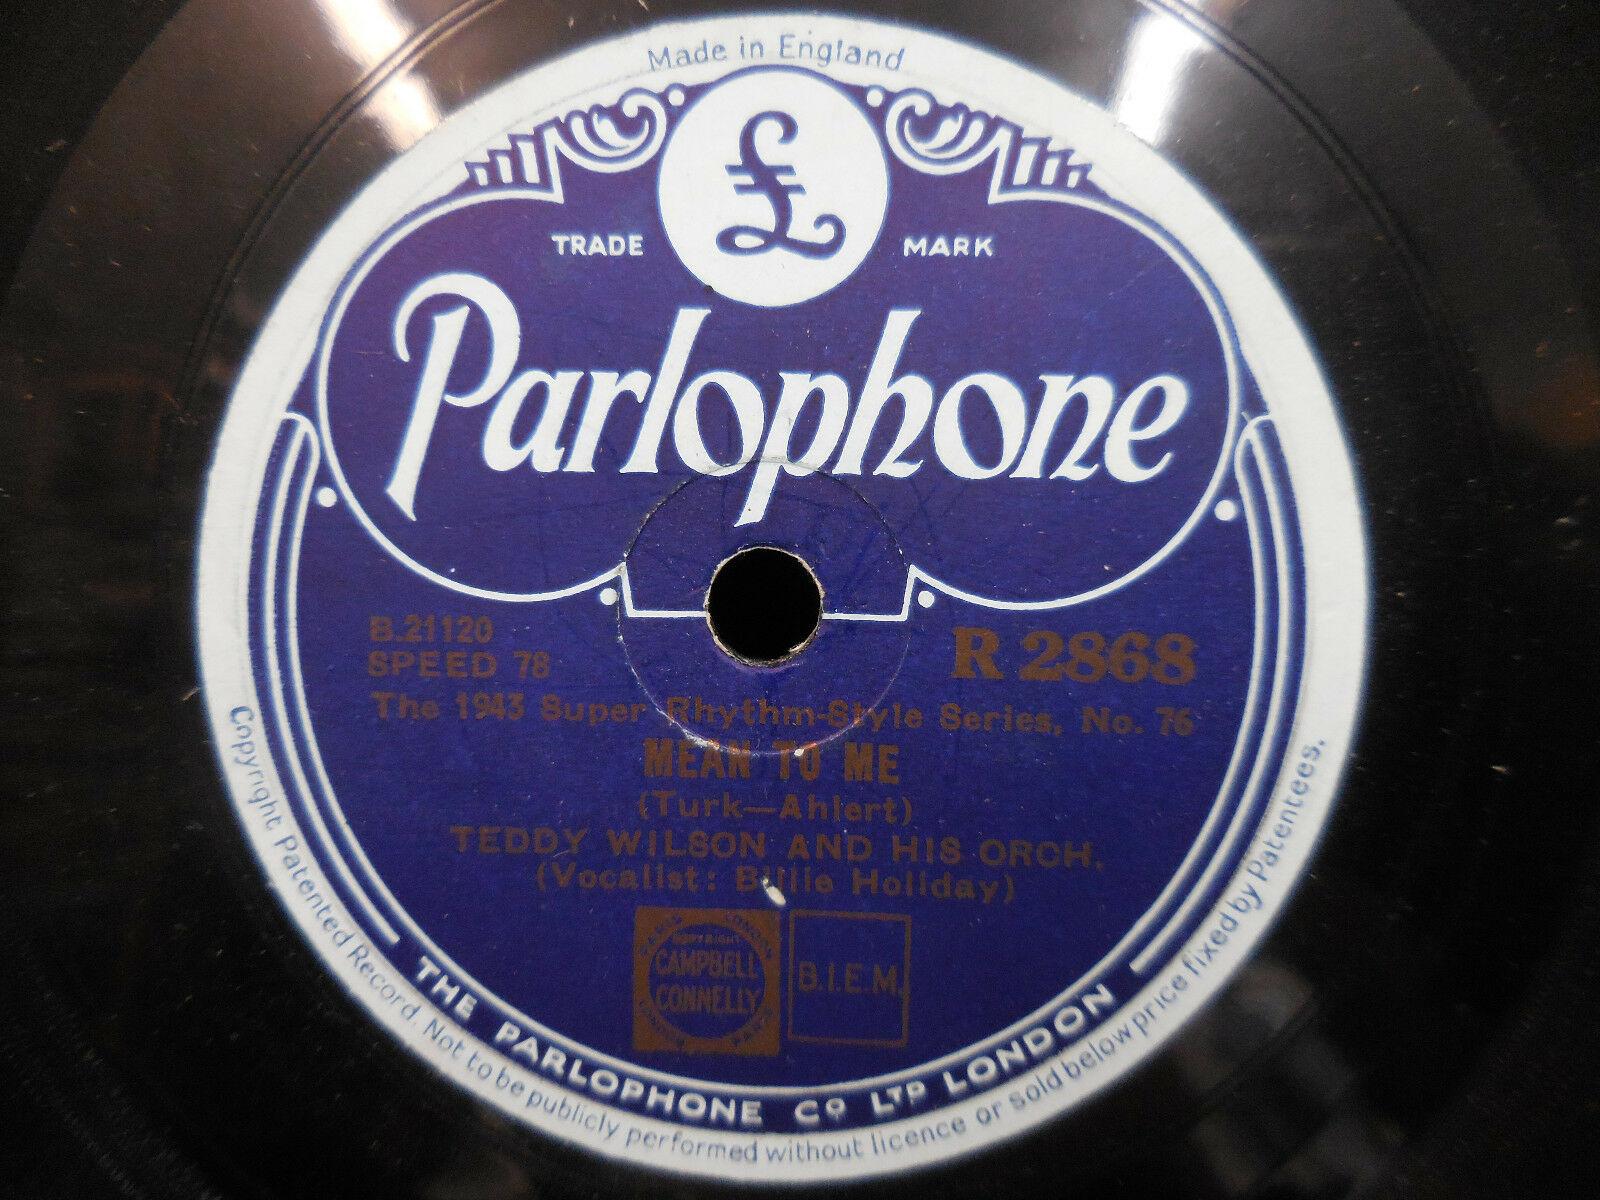 TEDDY WILSON BILLIE HOLIDAY/ELLA FITZGERALD PARLOPHONE R 2868 UK IMPORT 78 RPM